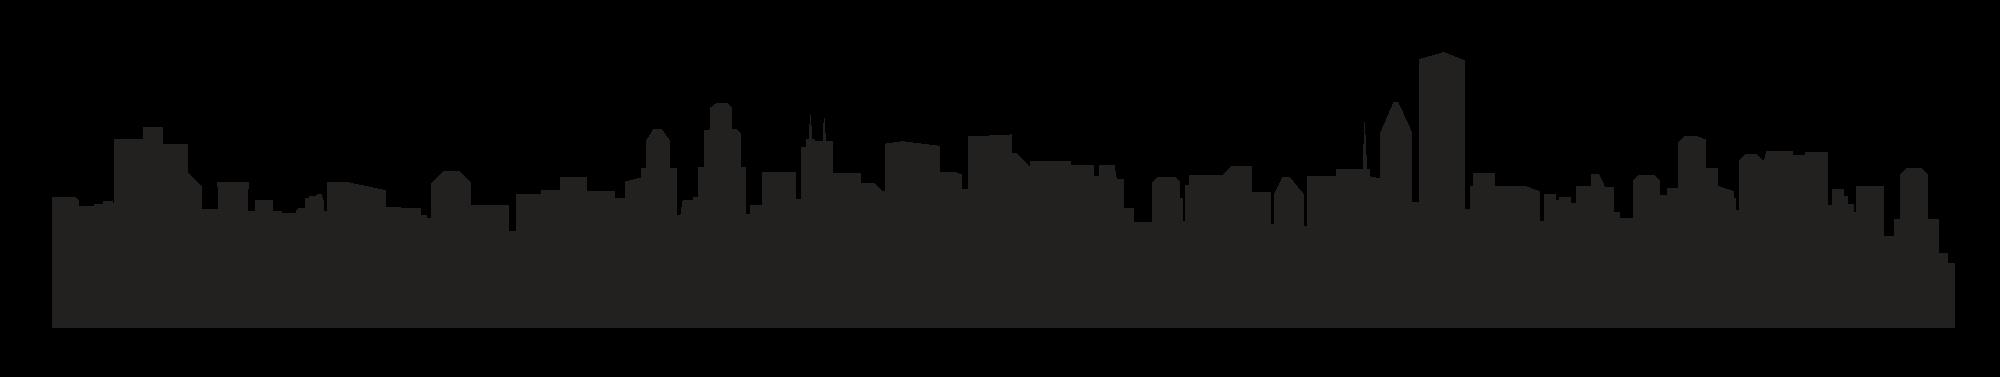 2000x377 City Skyline Silhouette Clip Art